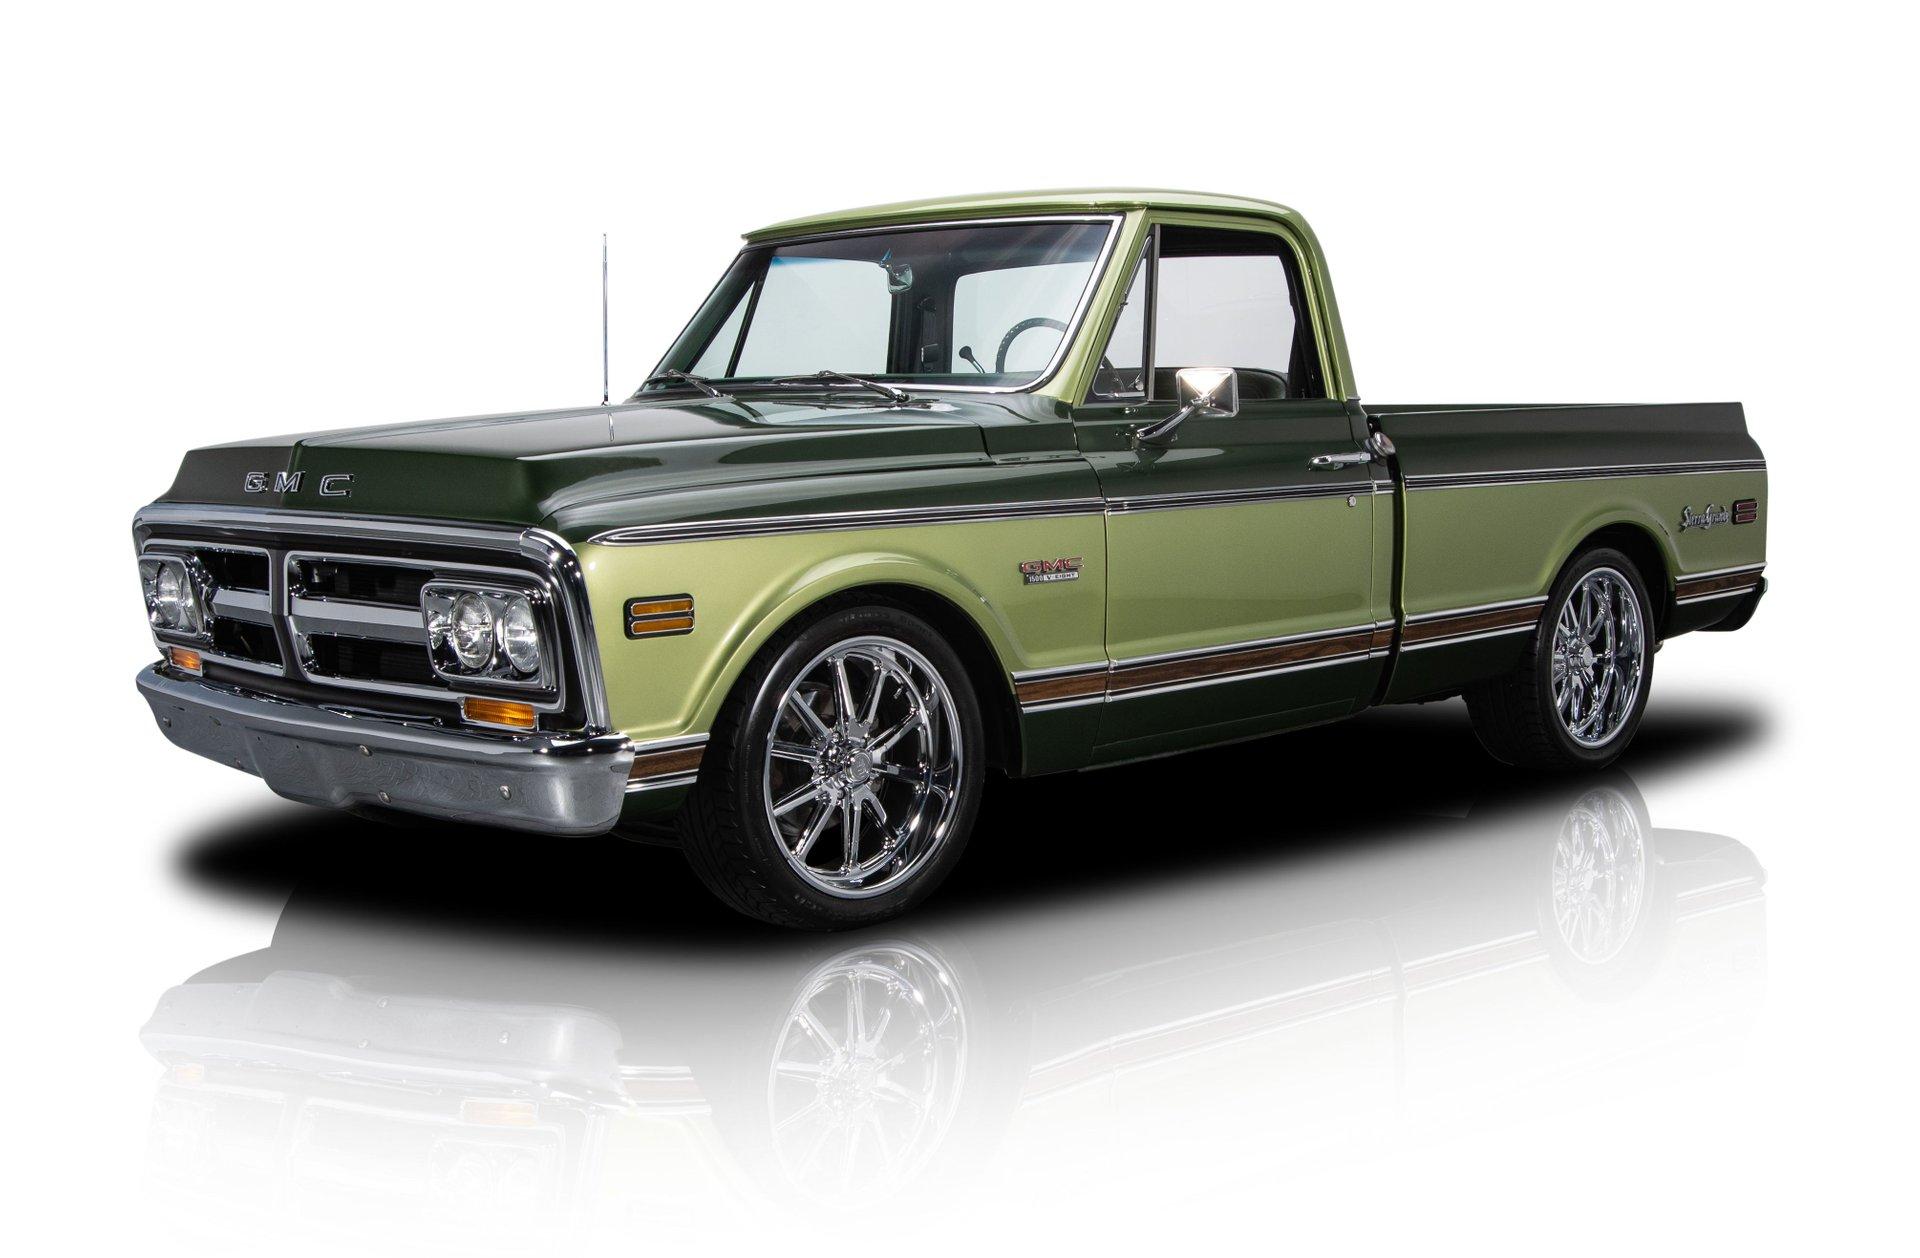 1970 gmc sierra grande pickup truck